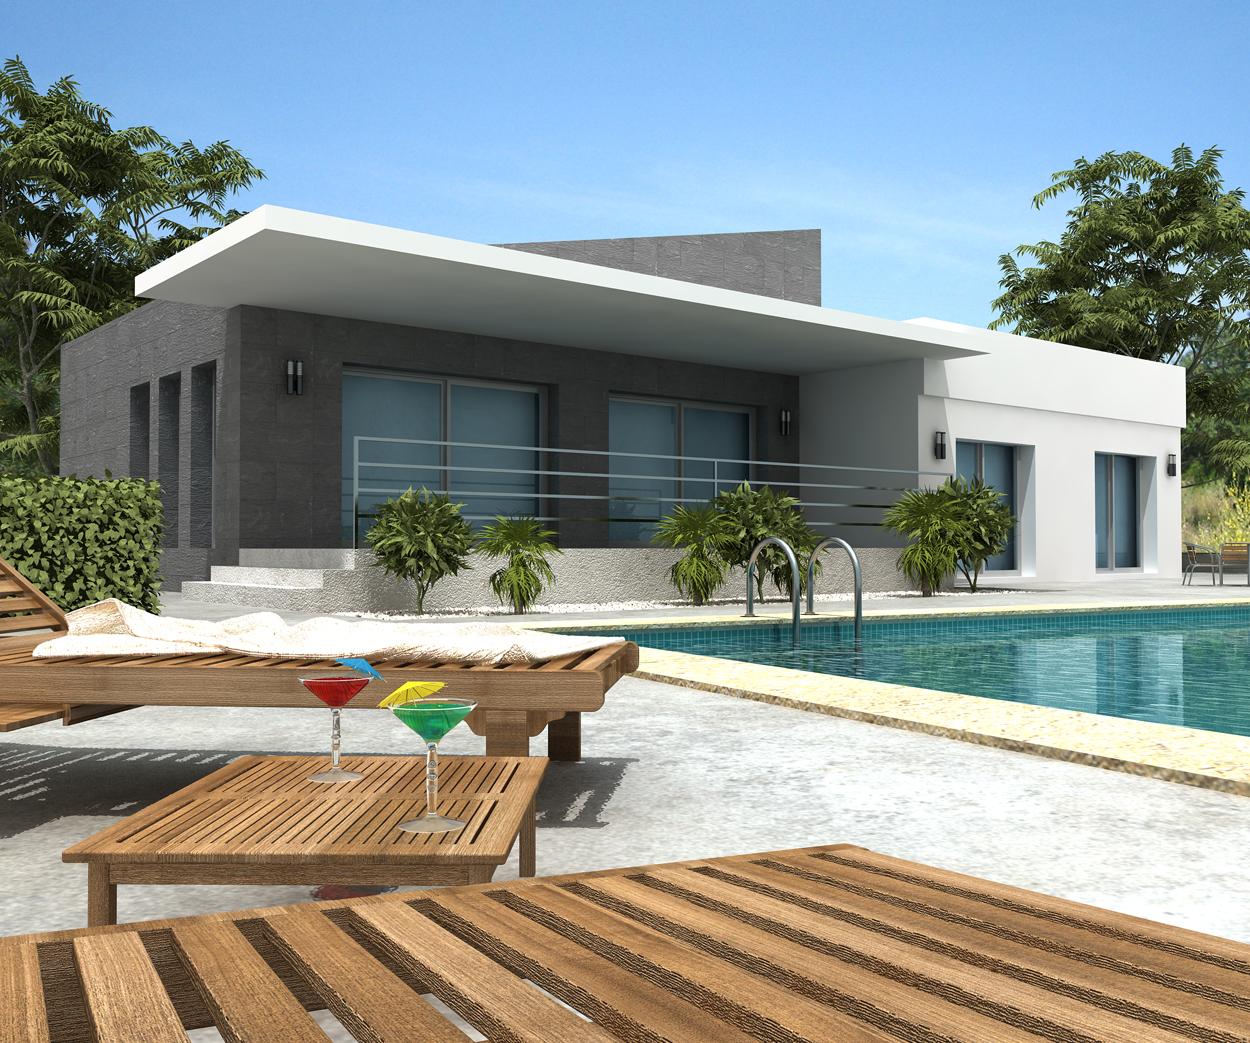 New home designs latest Modern villa designs